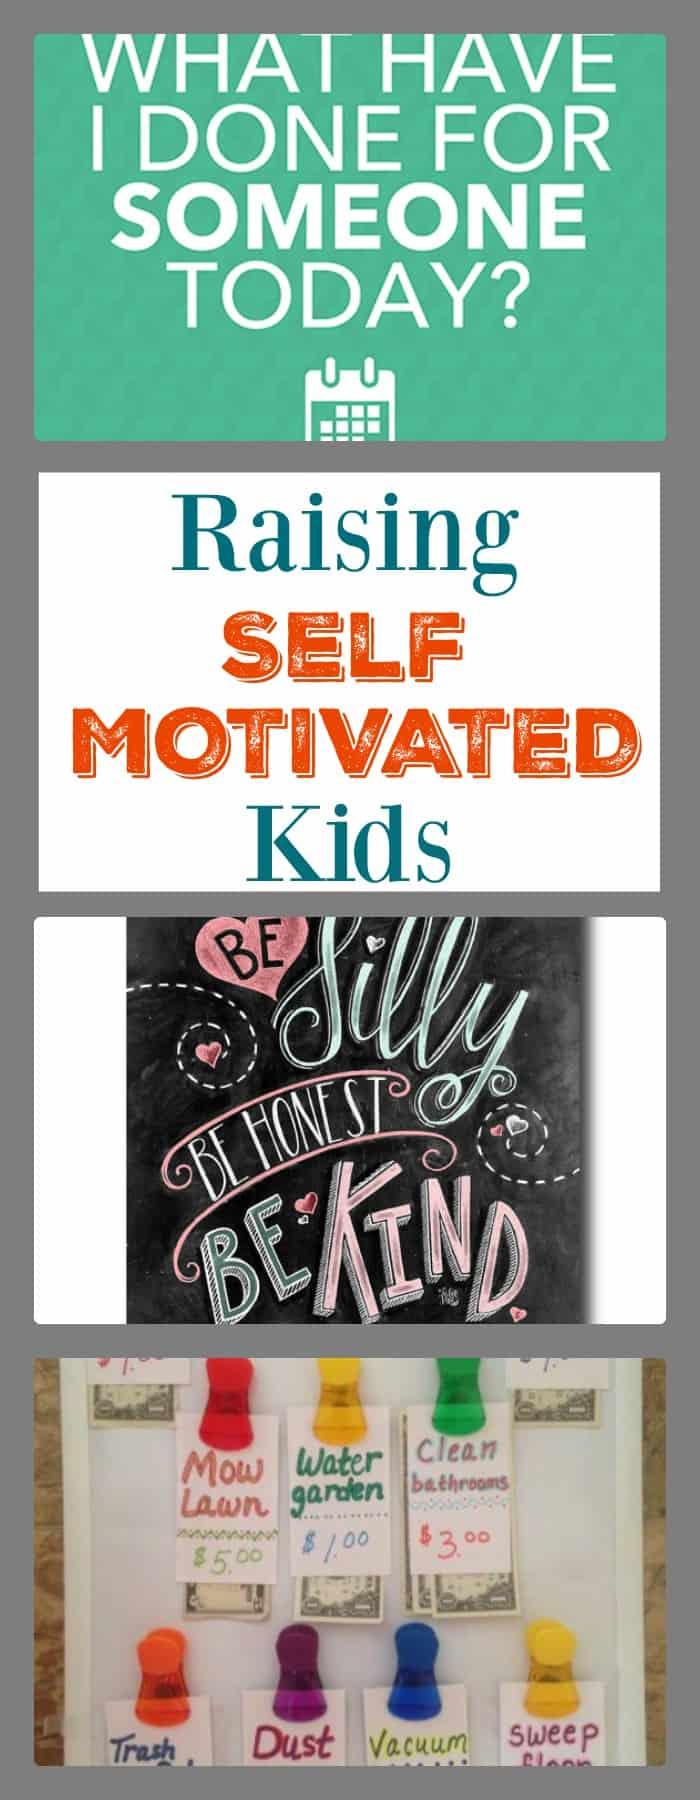 Parenting ideas- raising self motivated kids